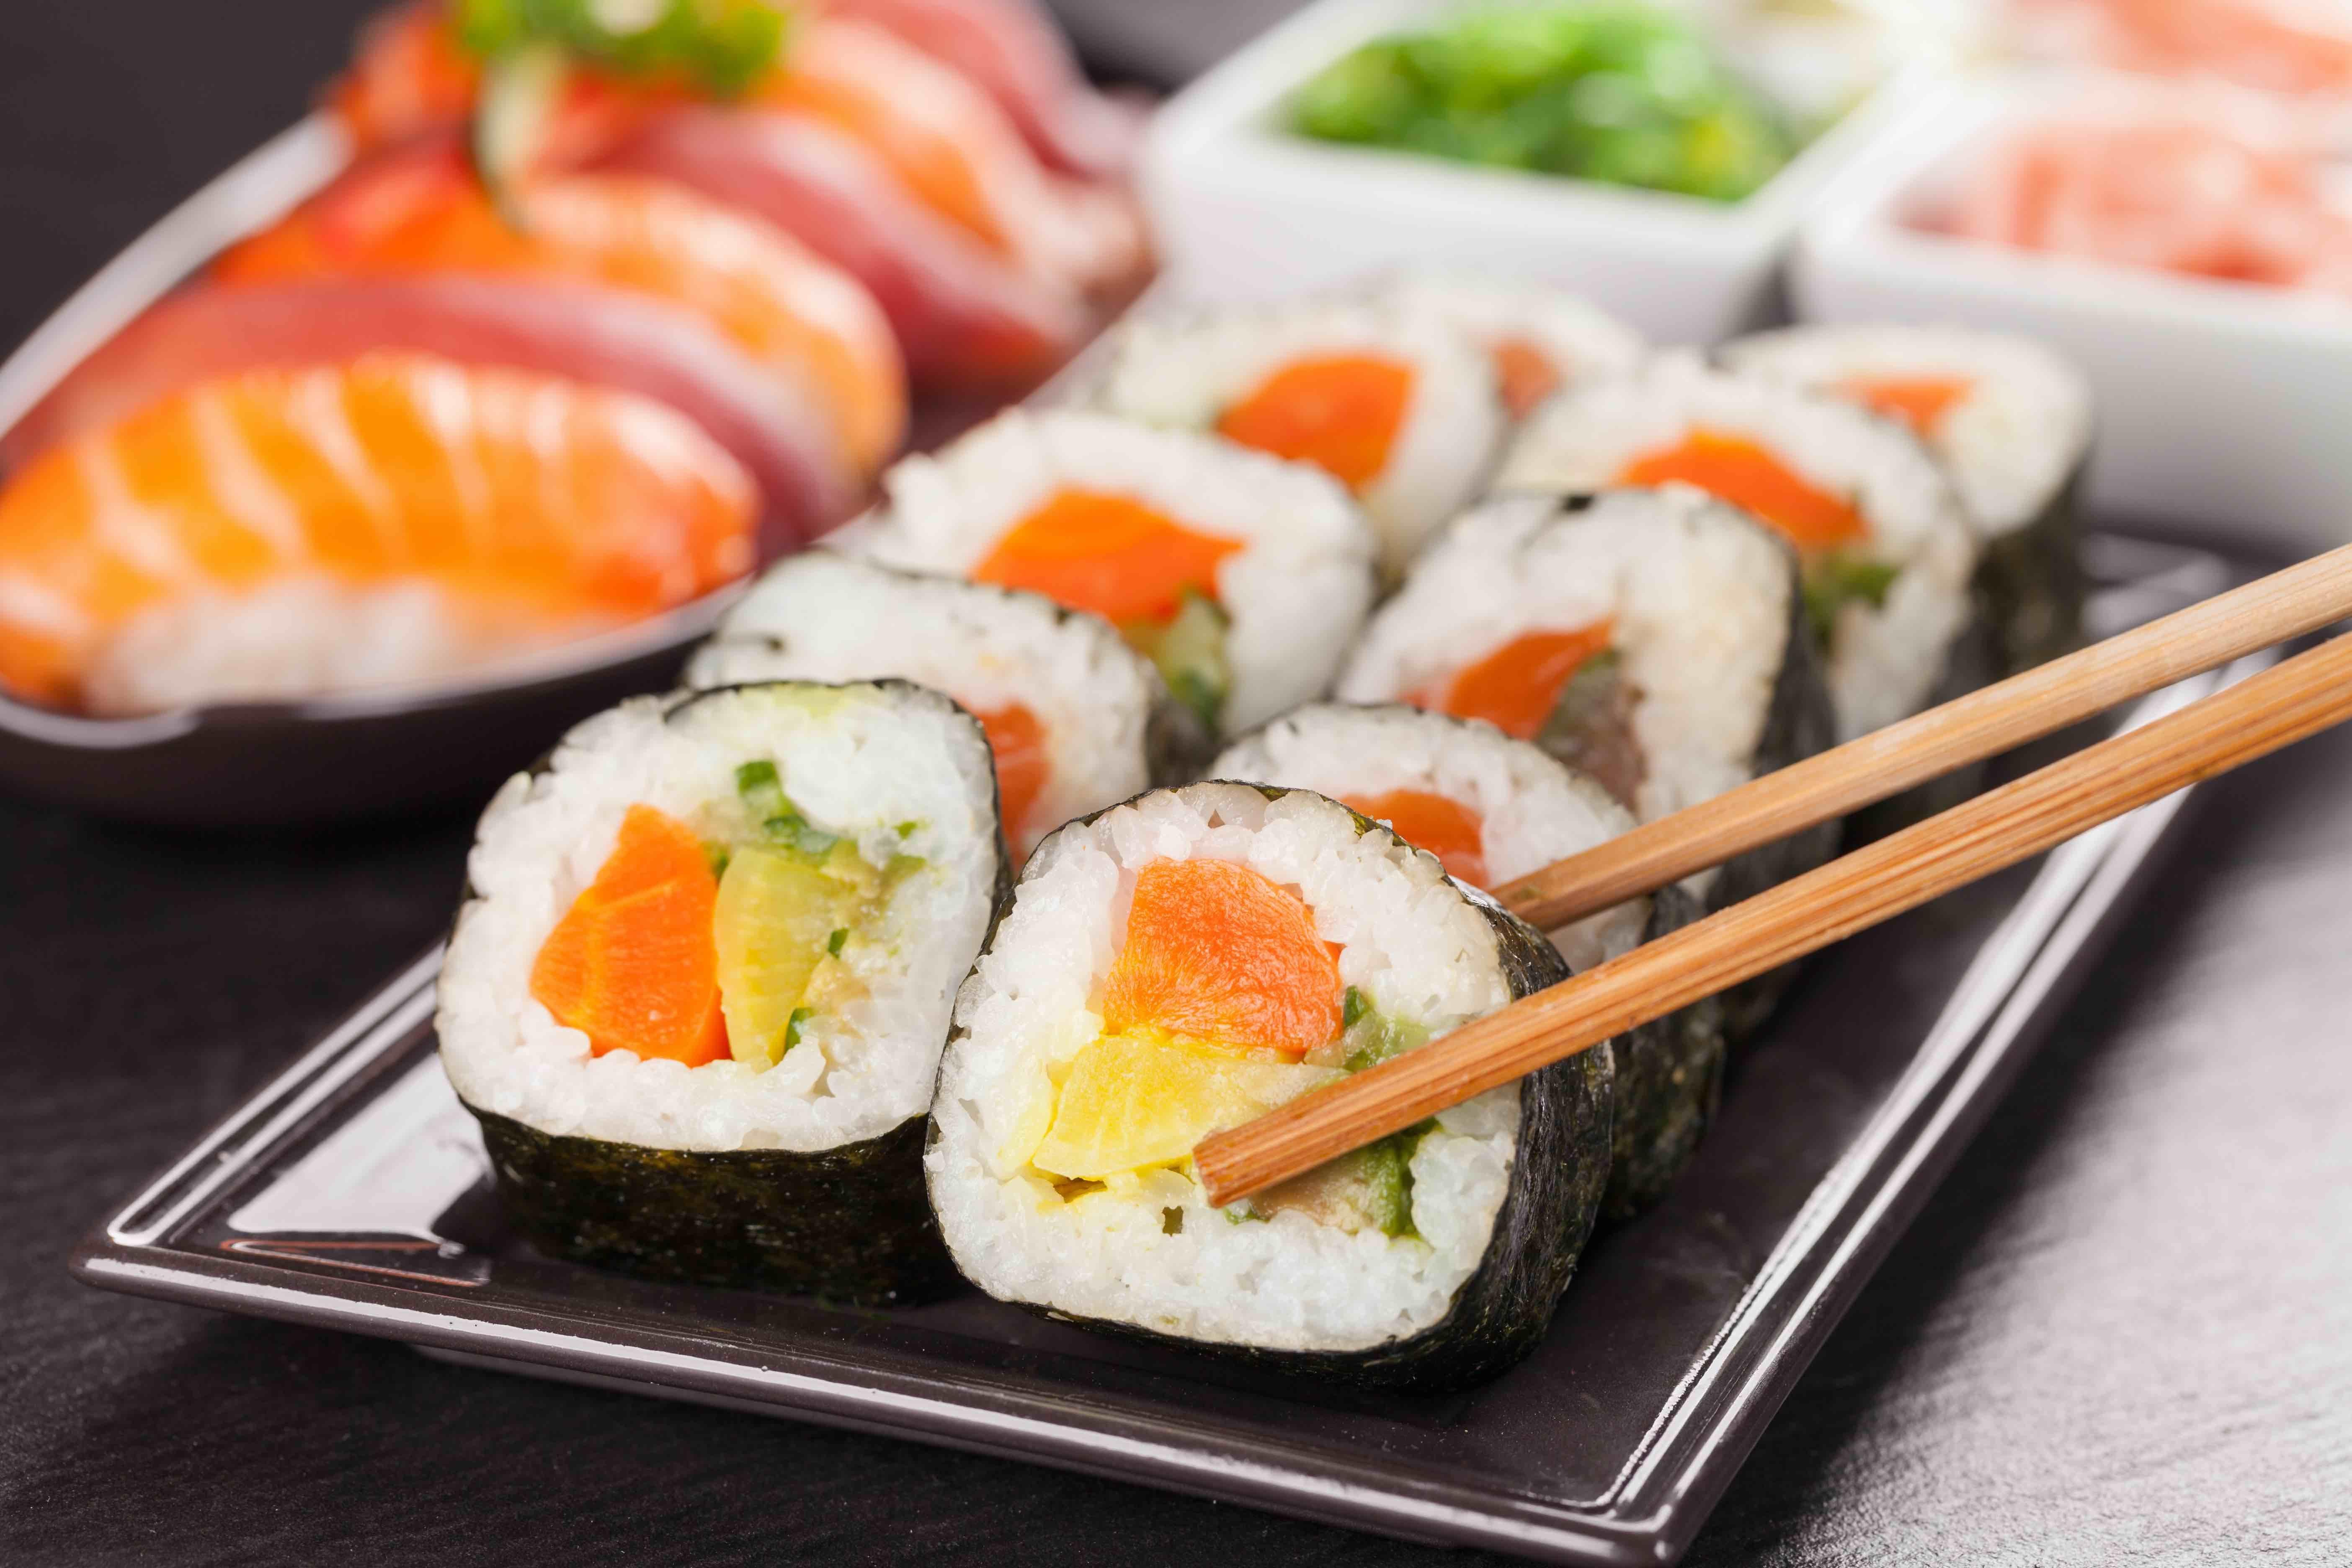 Fuji Yummy Sushi & Hibachi in Fond du Lac - Highlight